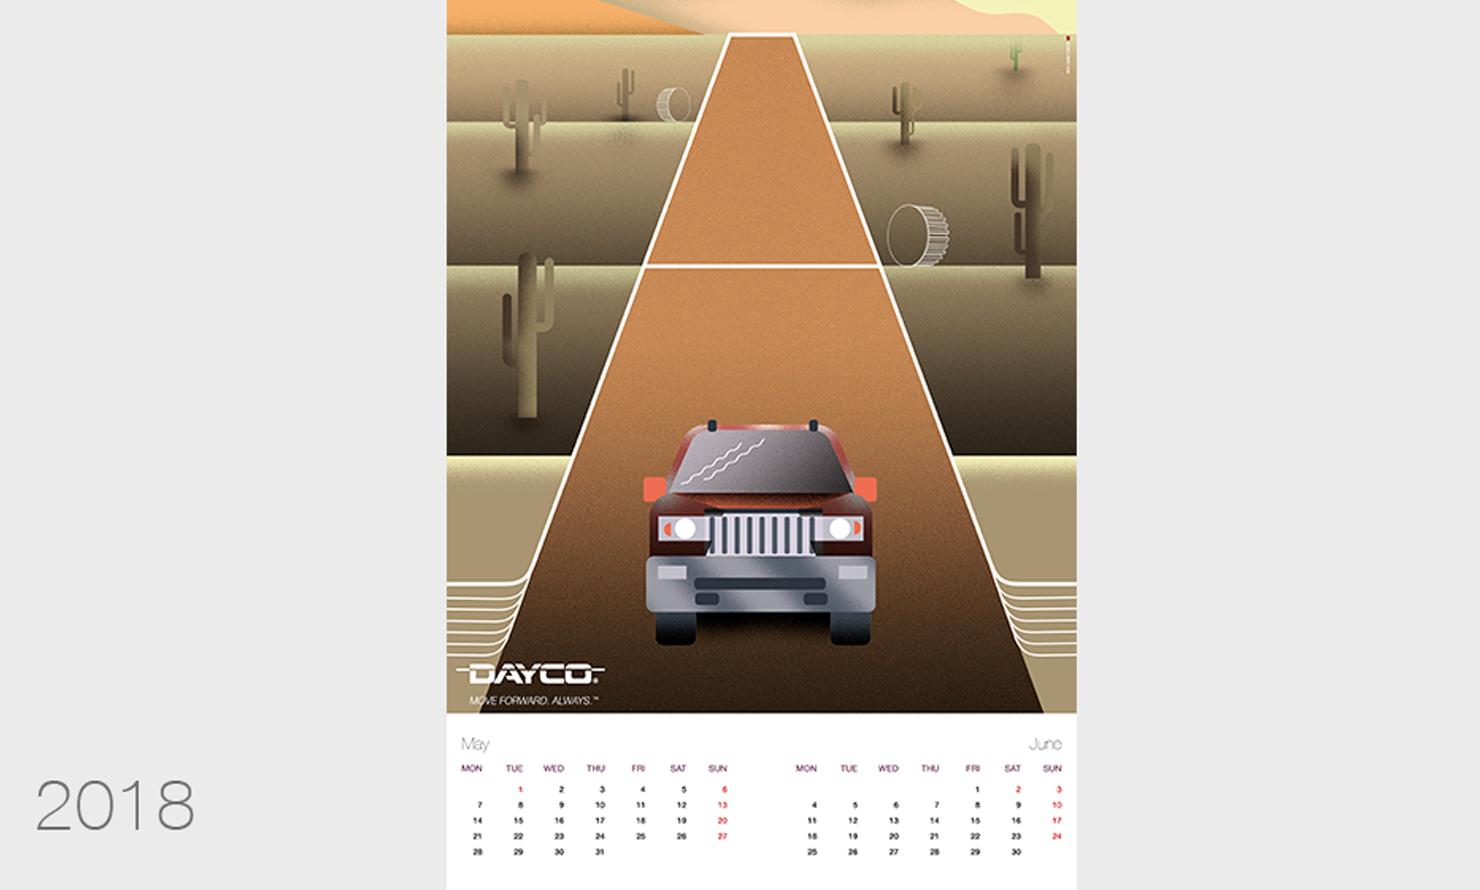 https://kubelibre.com/uploads/Slider-work-tutti-clienti/dayco-calendario-2018-3.jpg